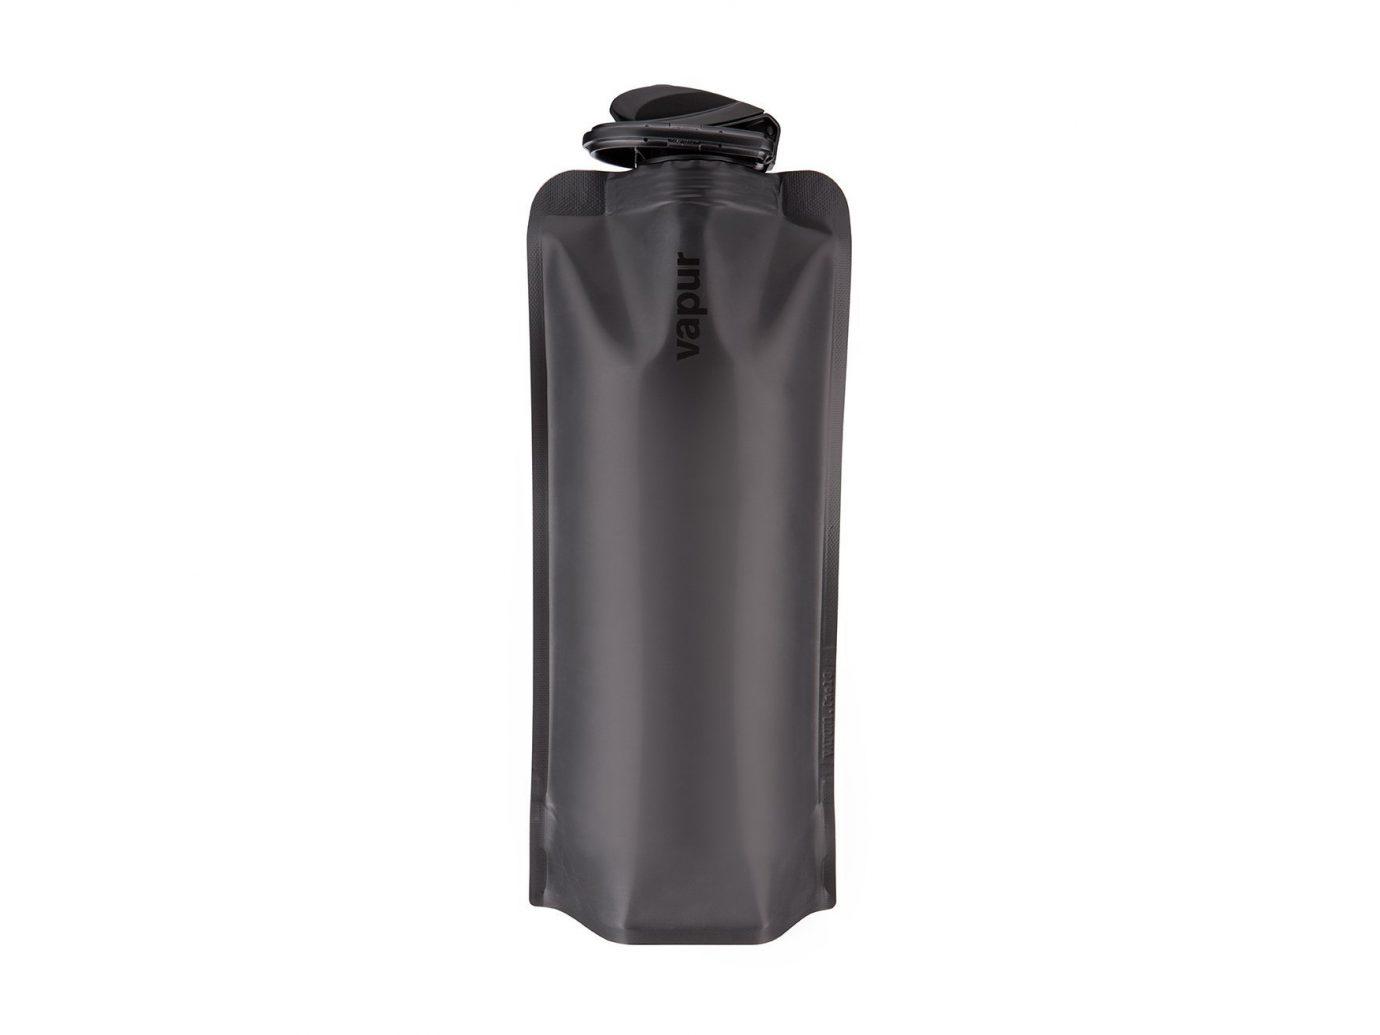 Vapur Eclipse Foldable Flexible Water Bottle